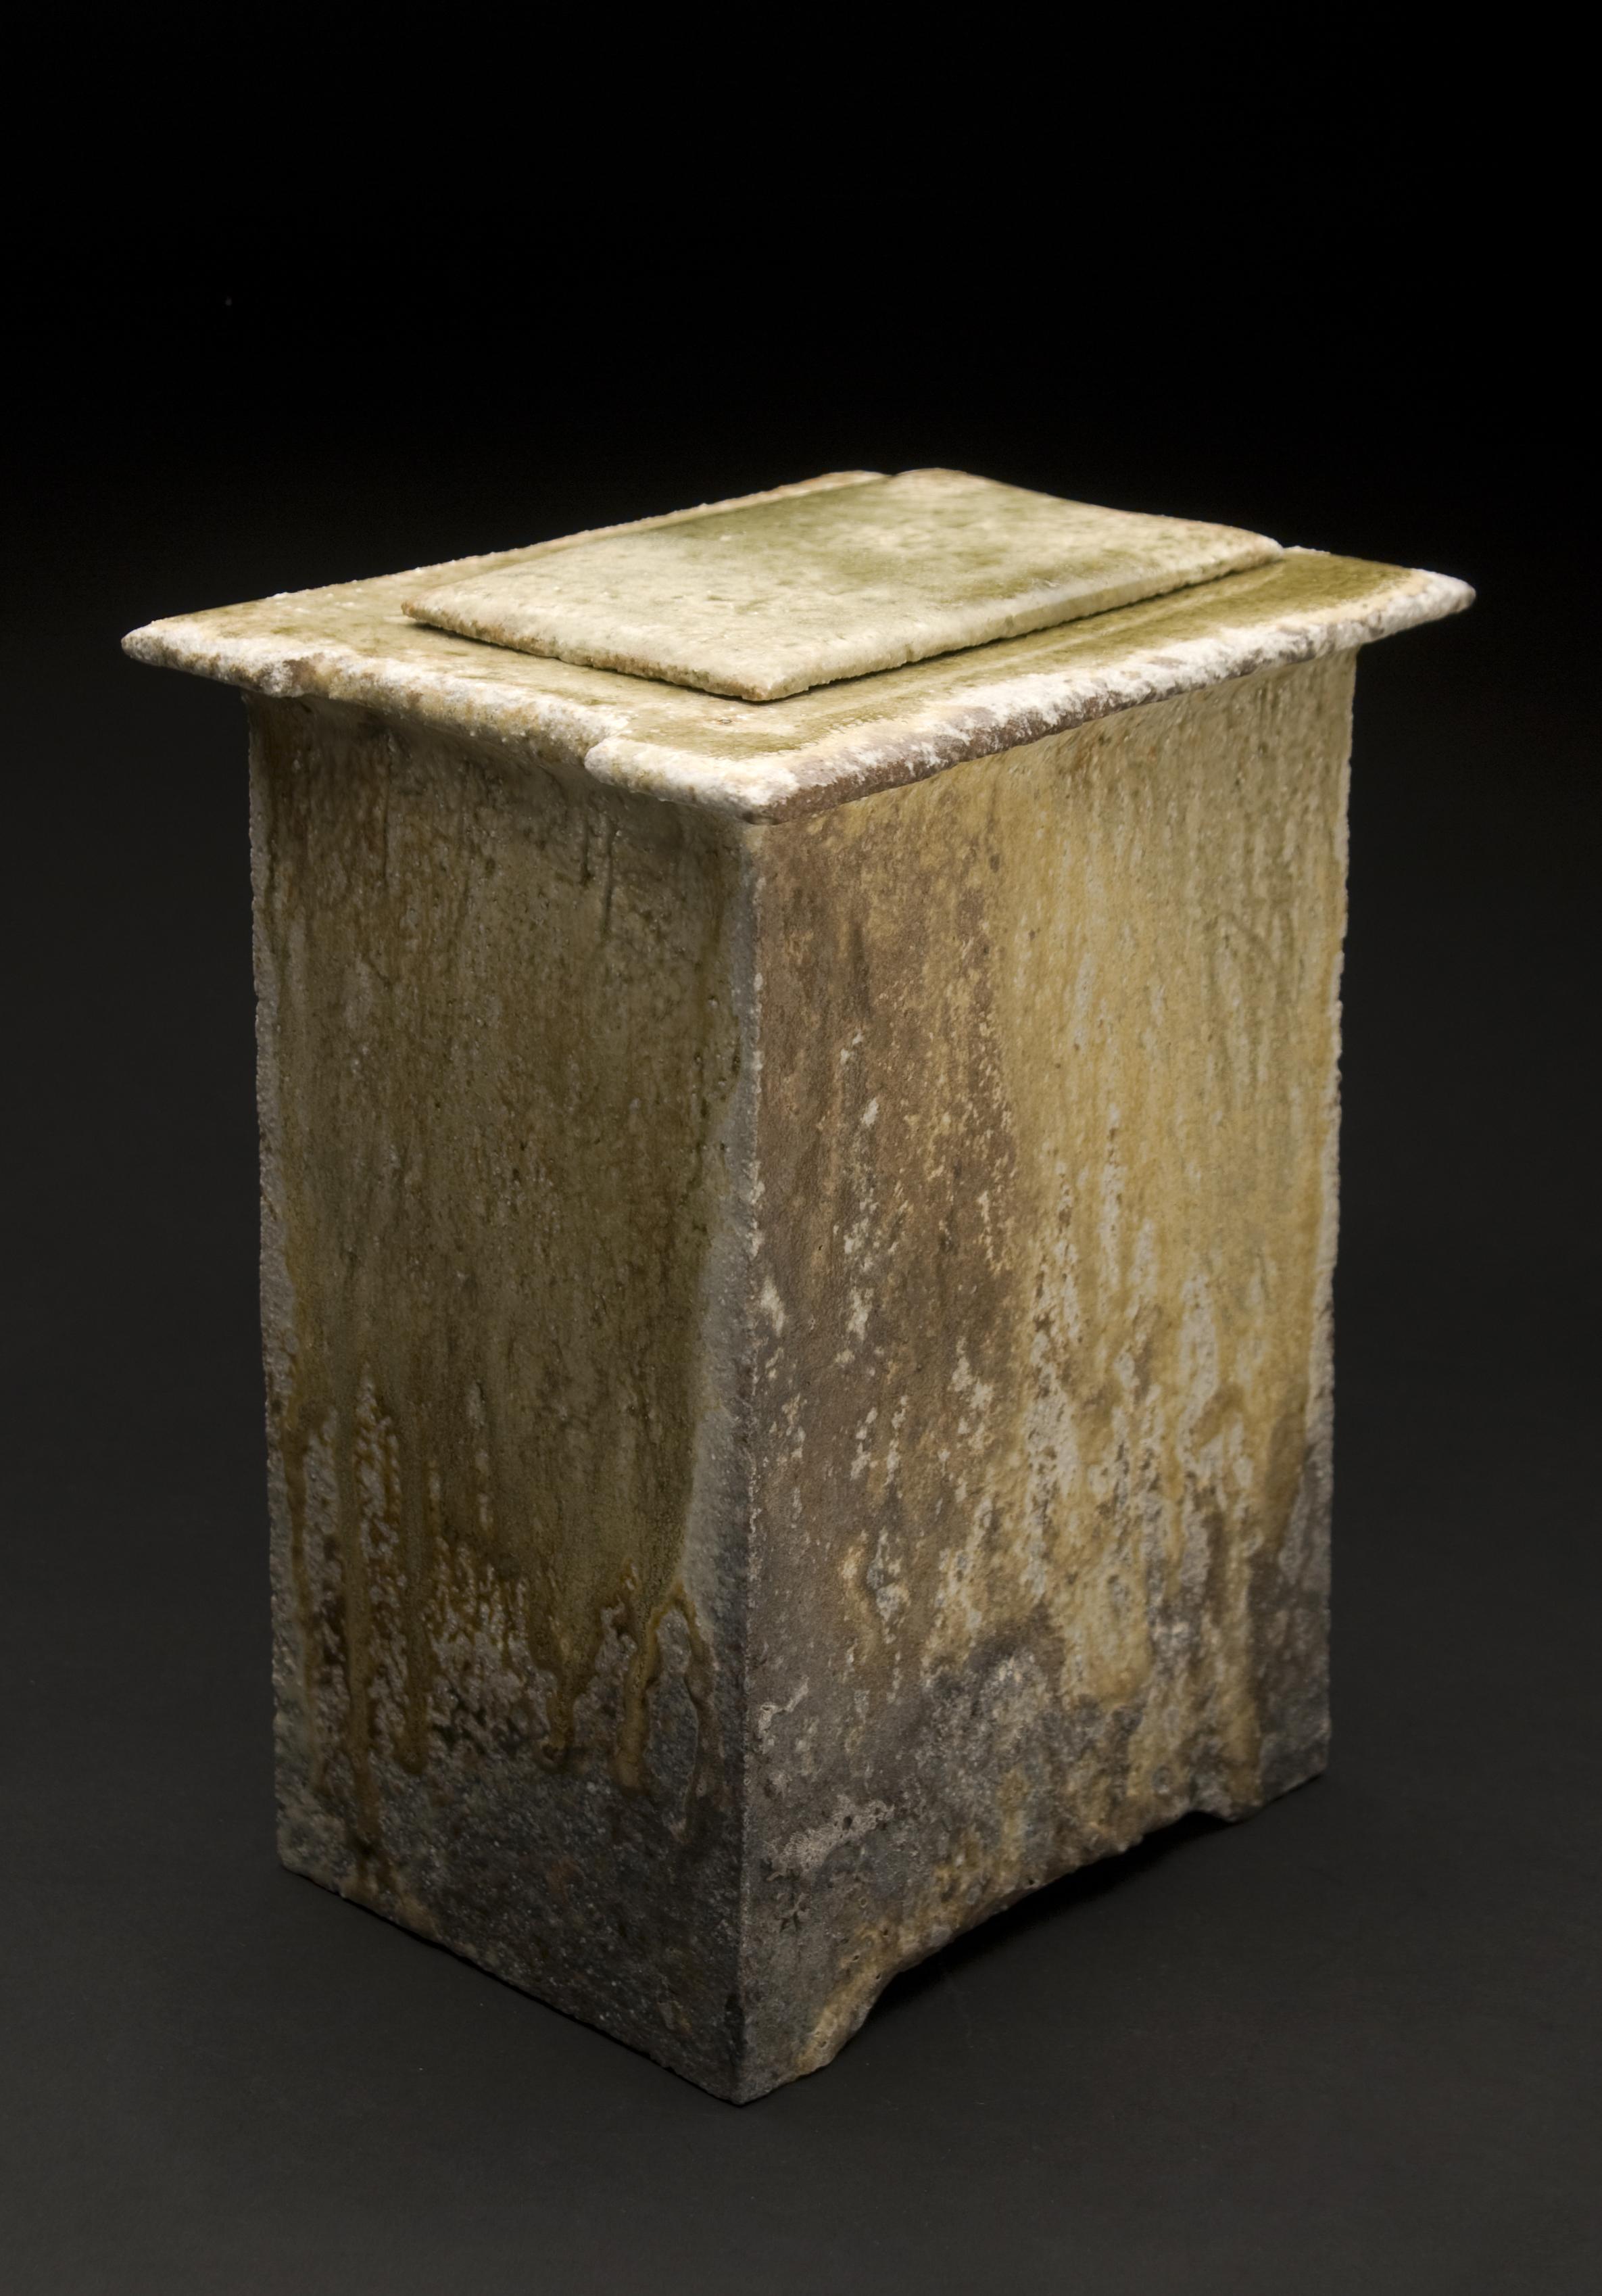 Yoh Tanimoto    Toubako (Large)  , 2011 Fired Ceramic 10 x 8 x 6 inches / 25.4 x 20.3 x 15.2 cm / YTa 1